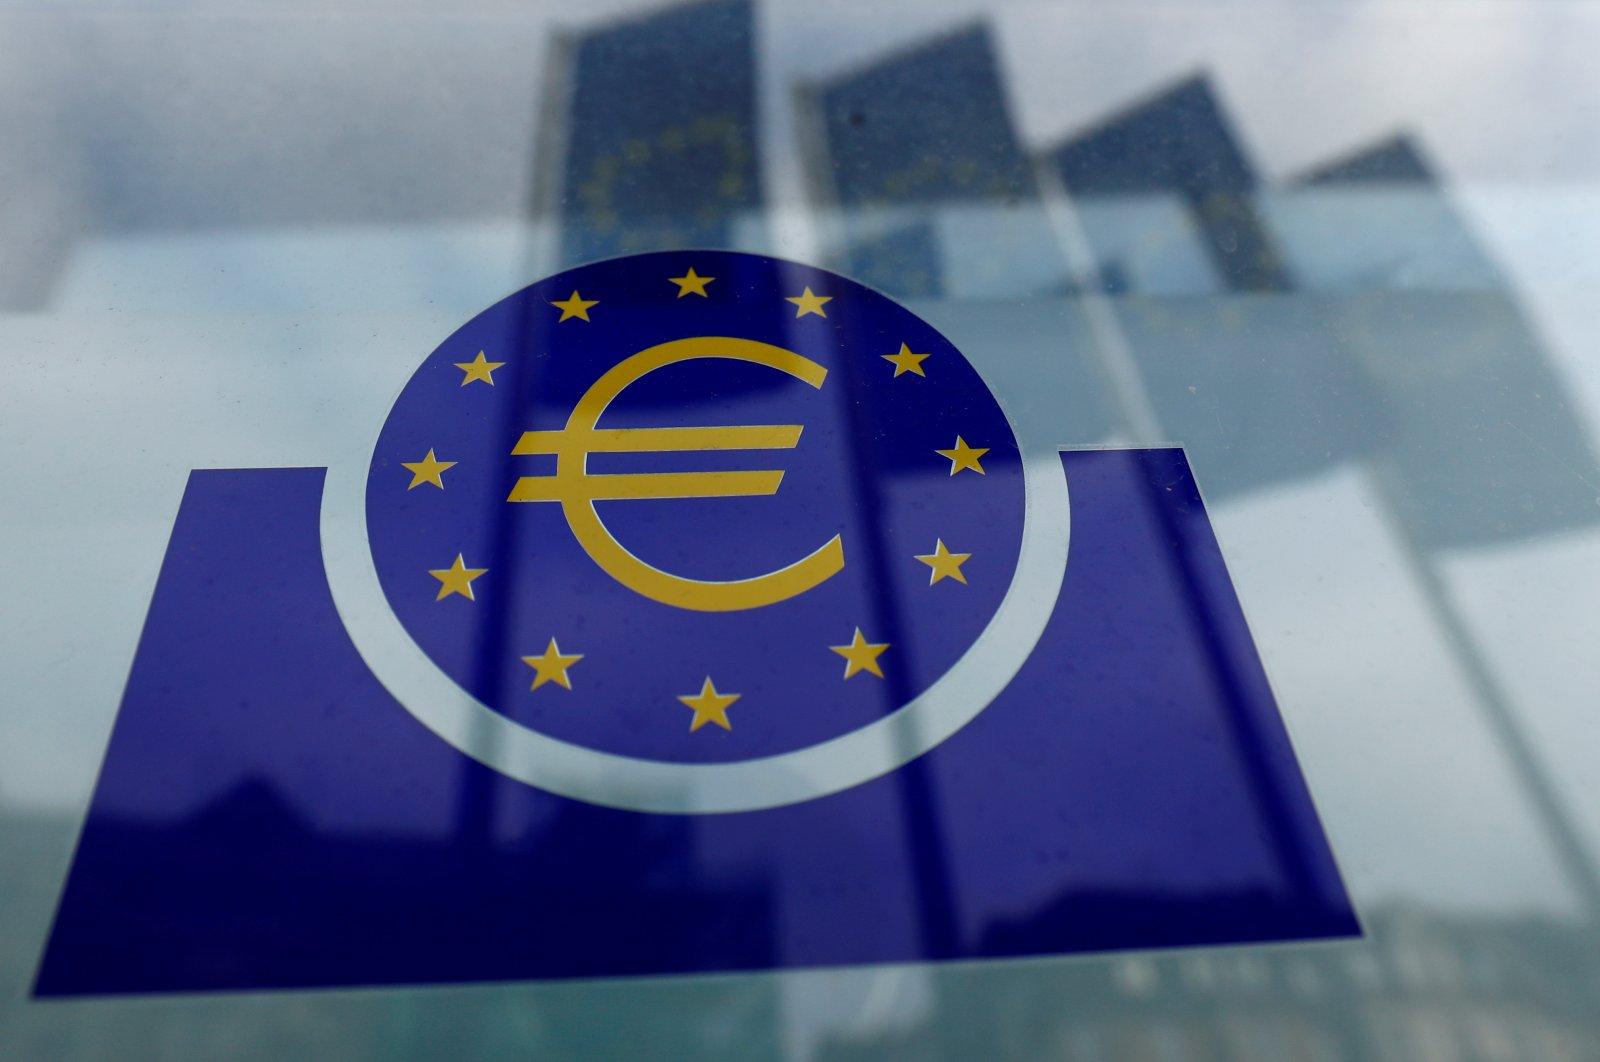 The European Central Bank logo, Frankfurt, Germany, Jan. 23, 2020. (Reuters Photo)